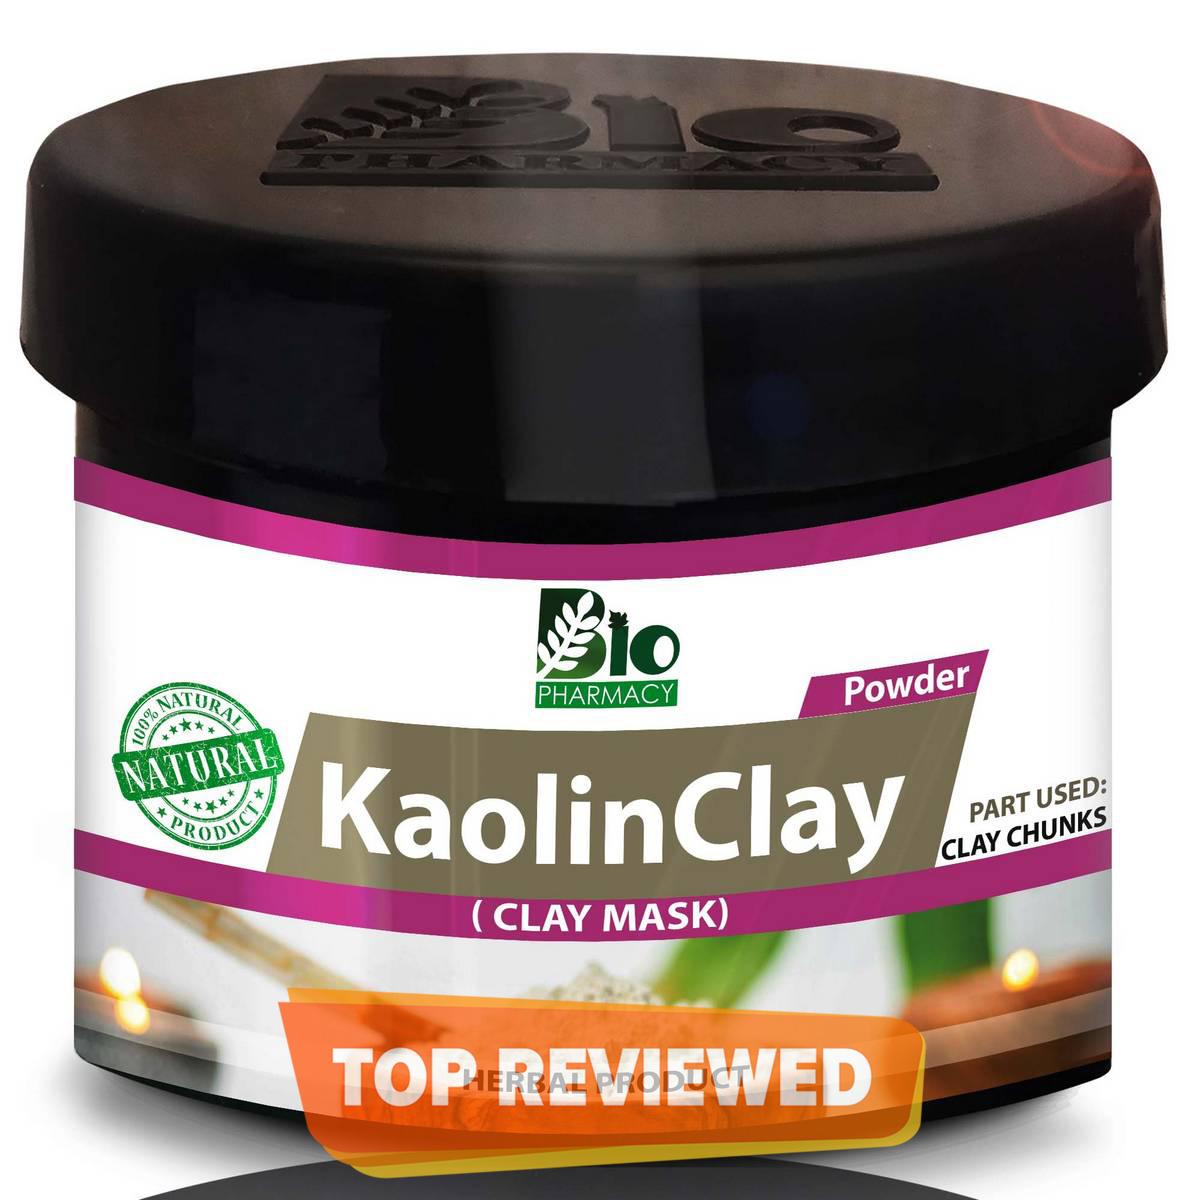 Kaolin Clay Powder  White Clay Mask Powder for Skin Pack 100% Natural